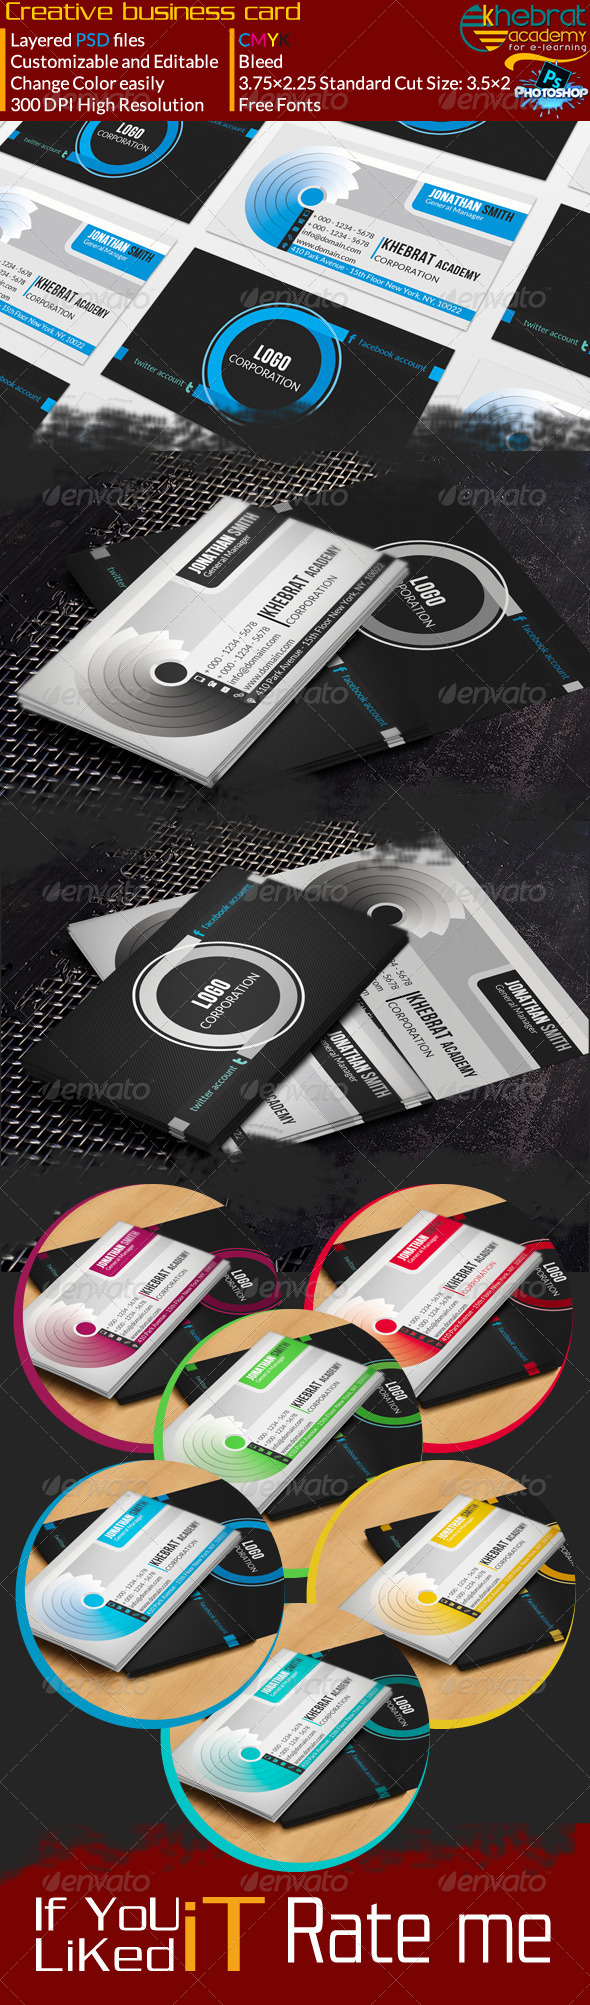 Creative Business Card V01 - Creative Business Cards